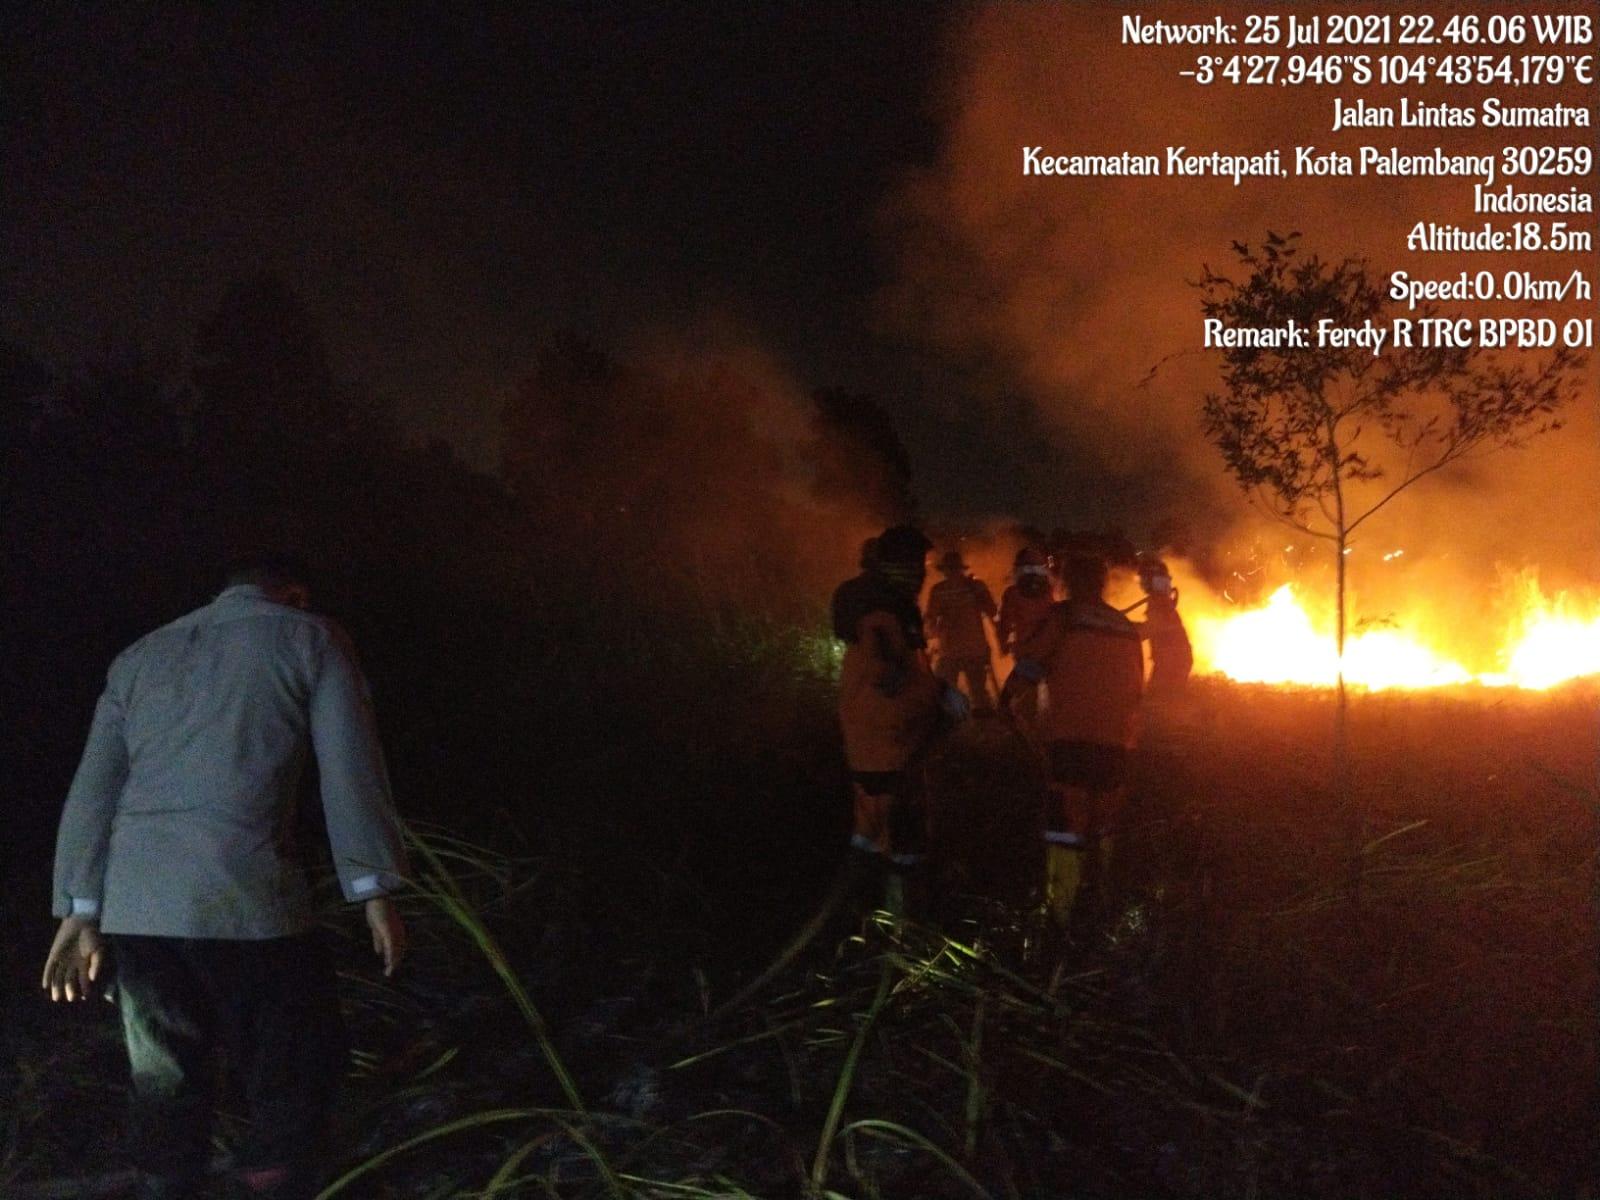 https: img.okezone.com content 2021 07 26 340 2445970 satgas-gabungan-ogan-ilir-berhasil-padamkan-4-04-hektare-lahan-terbakar-gT6OrXsYoF.jpeg